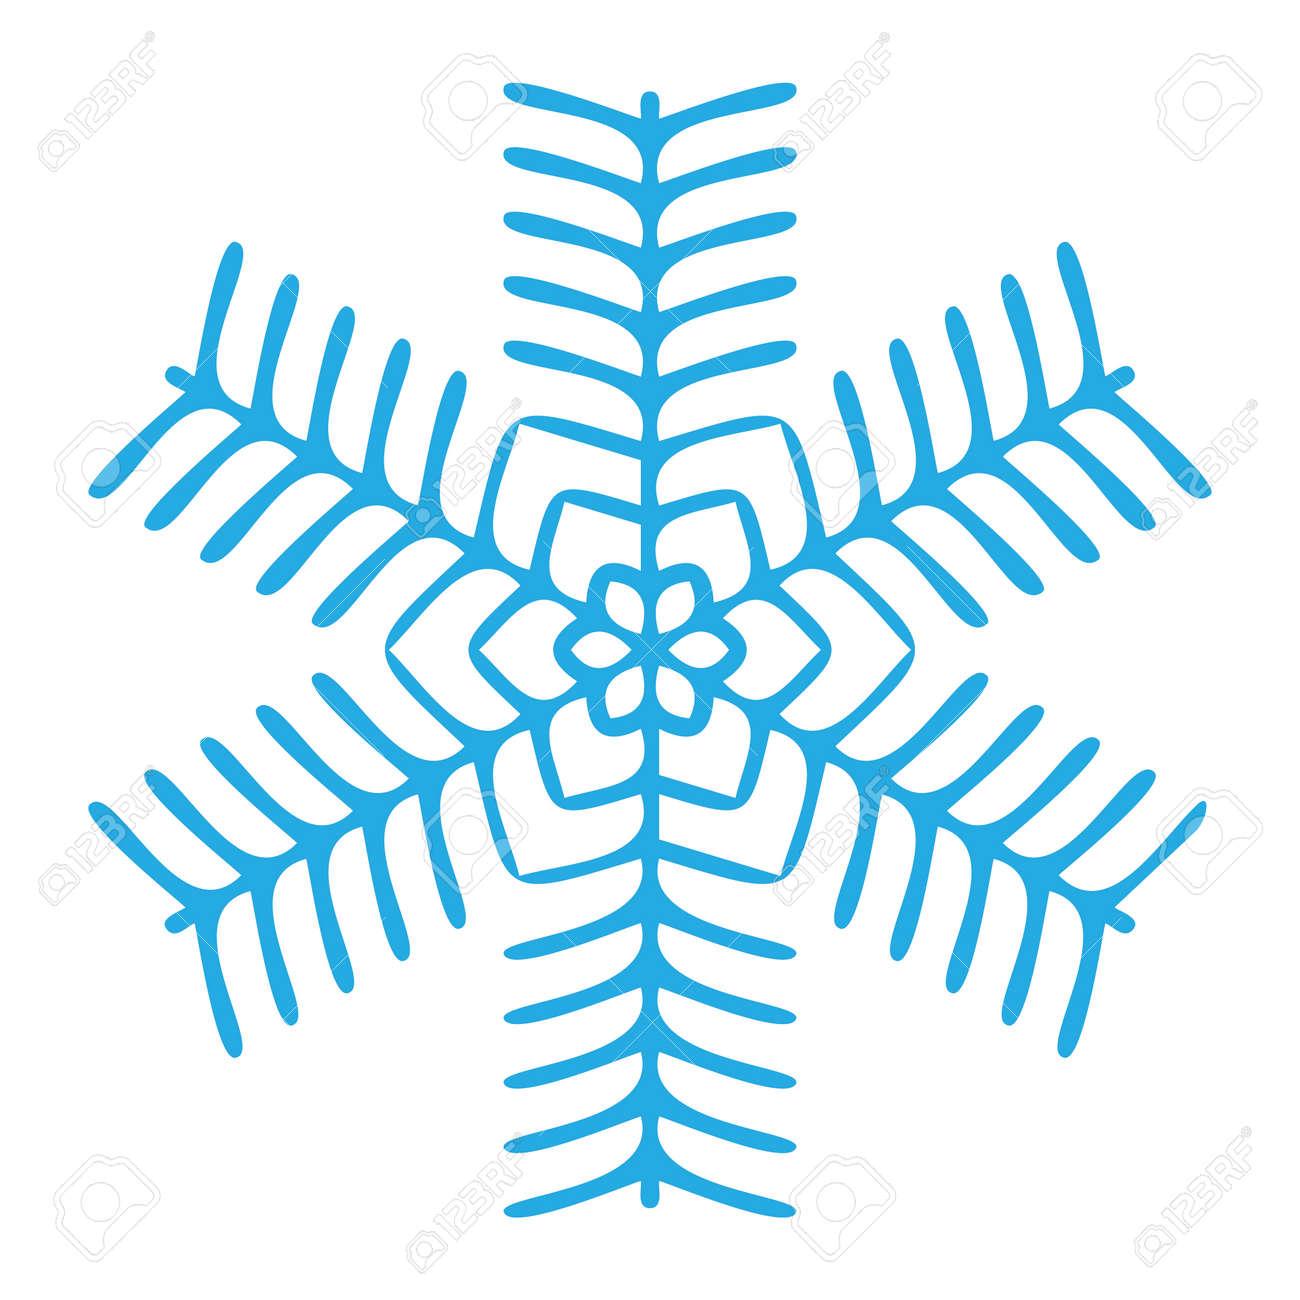 Snowflake winter blue symbol icon Stock Vector - 92279227